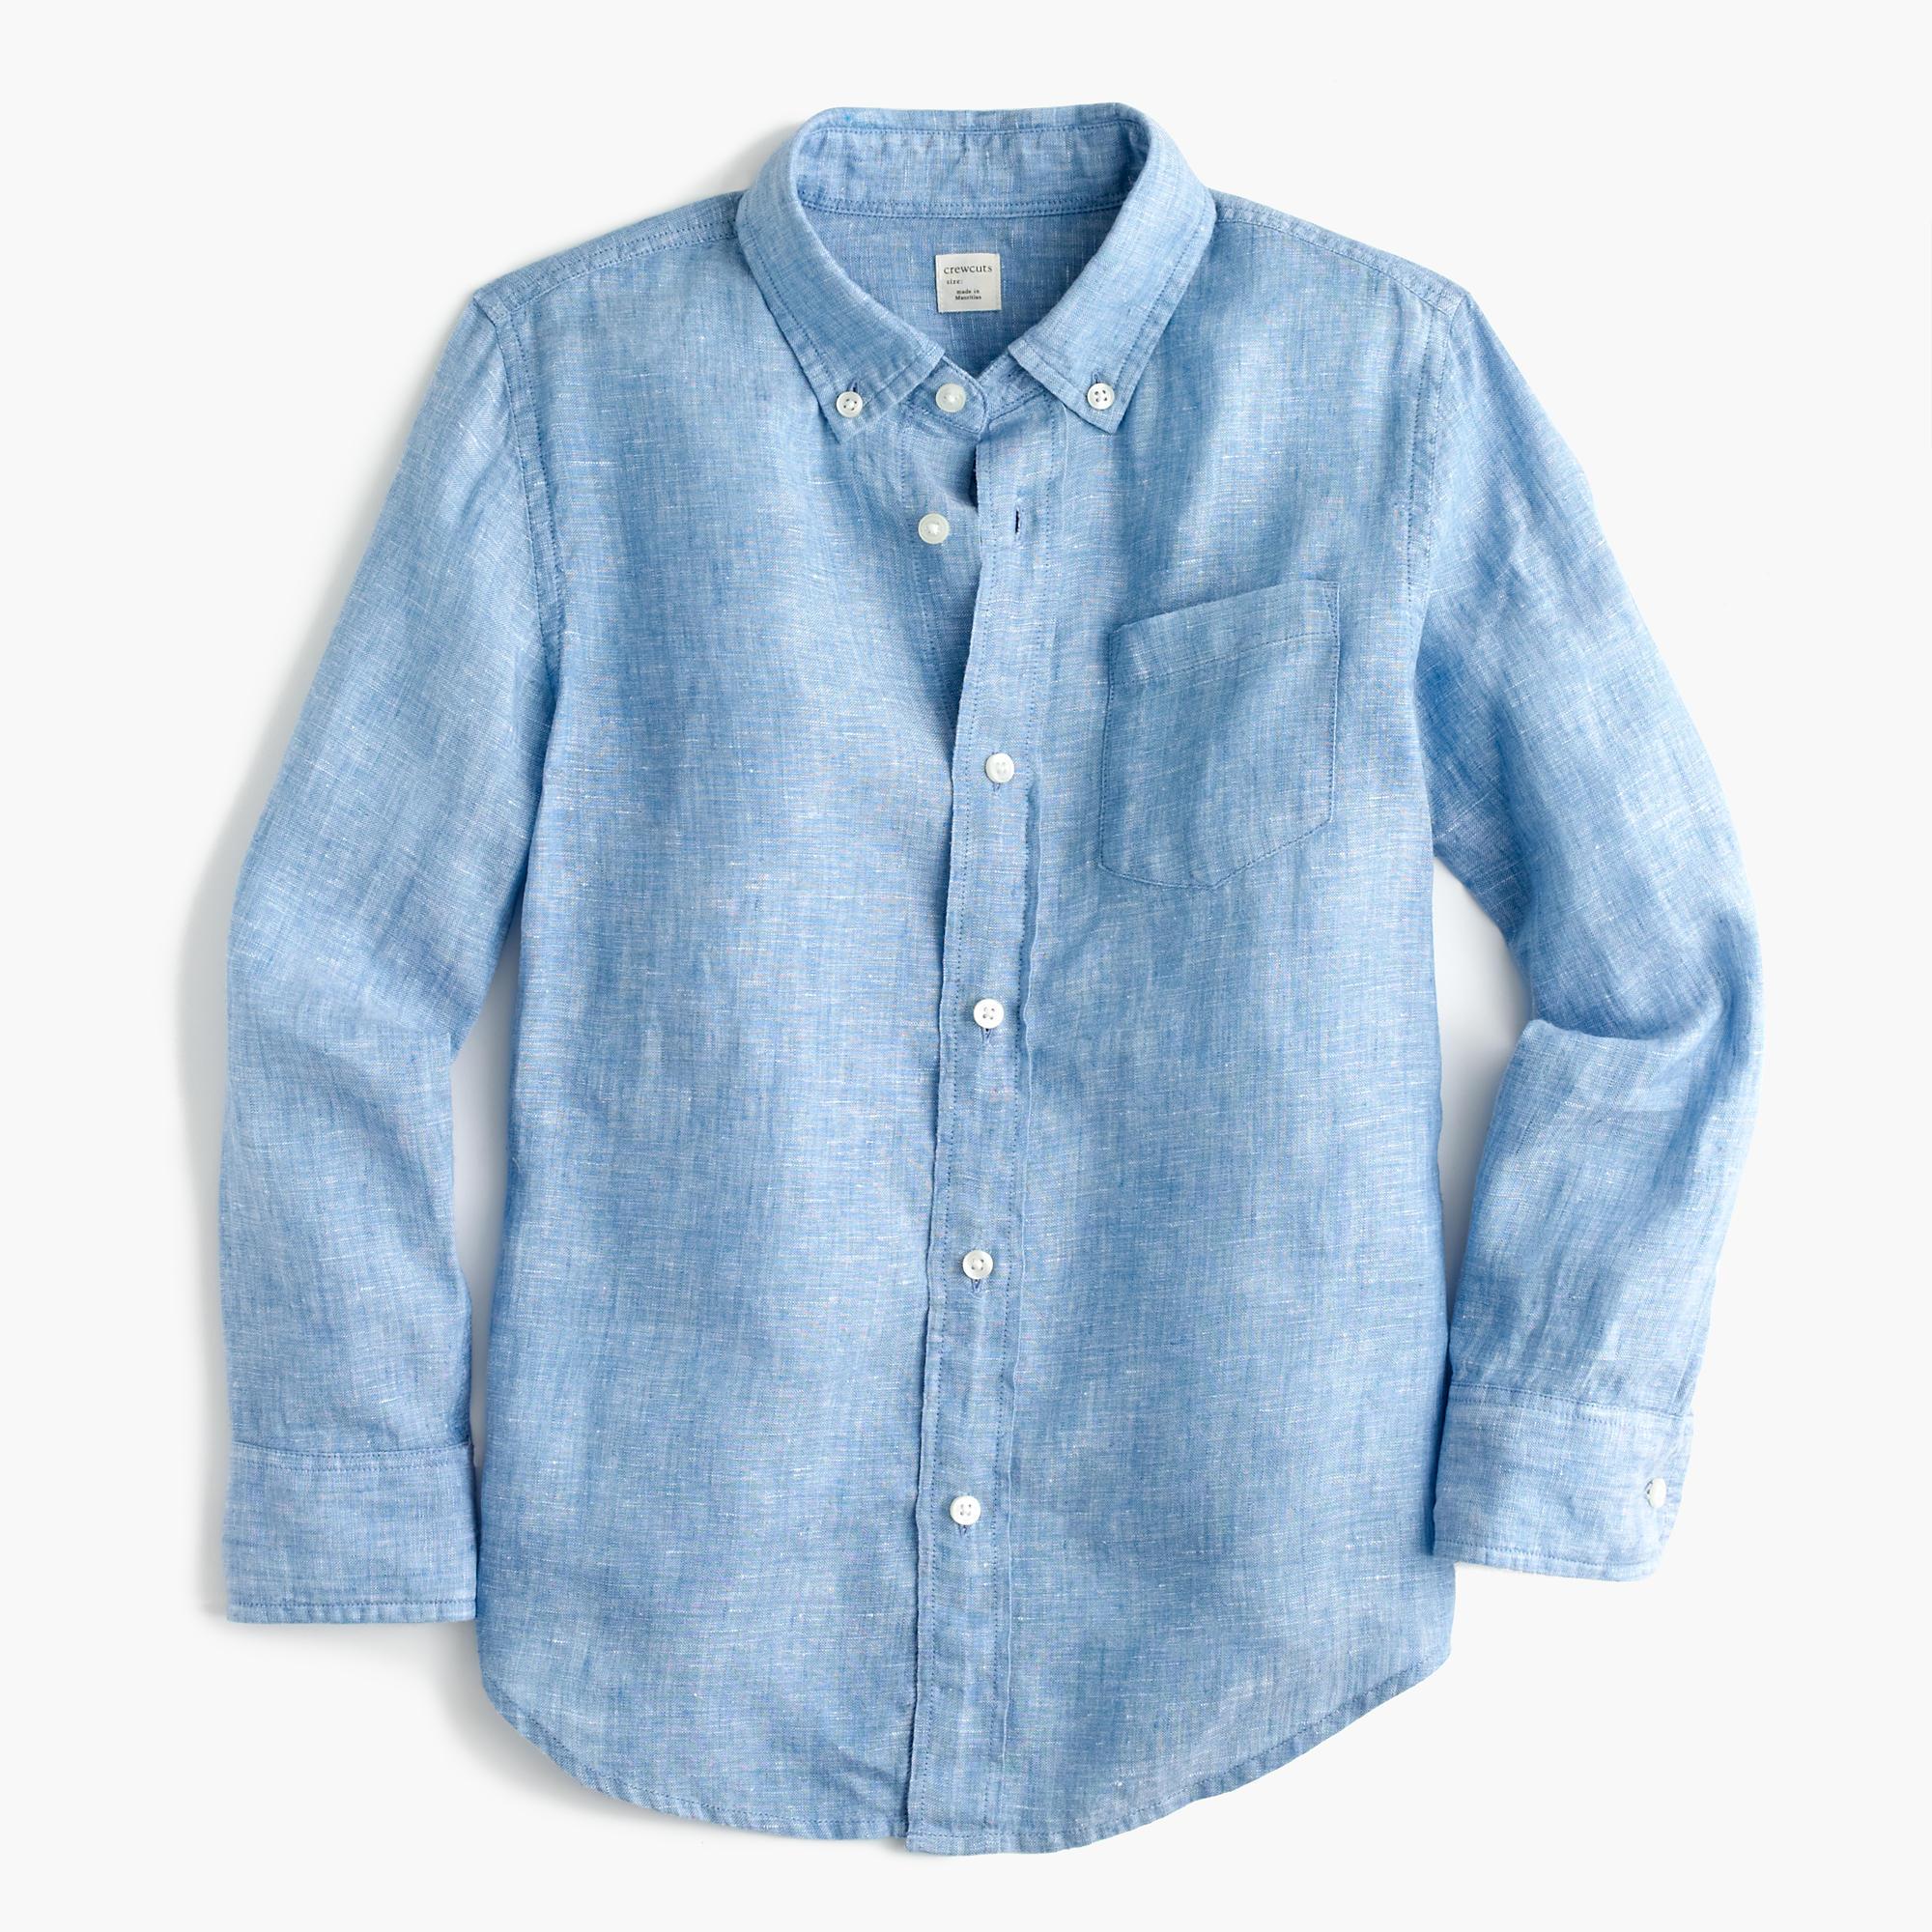 Kids 39 irish linen shirt in tide blue boys 39 shirts j crew for Irish linen dress shirts